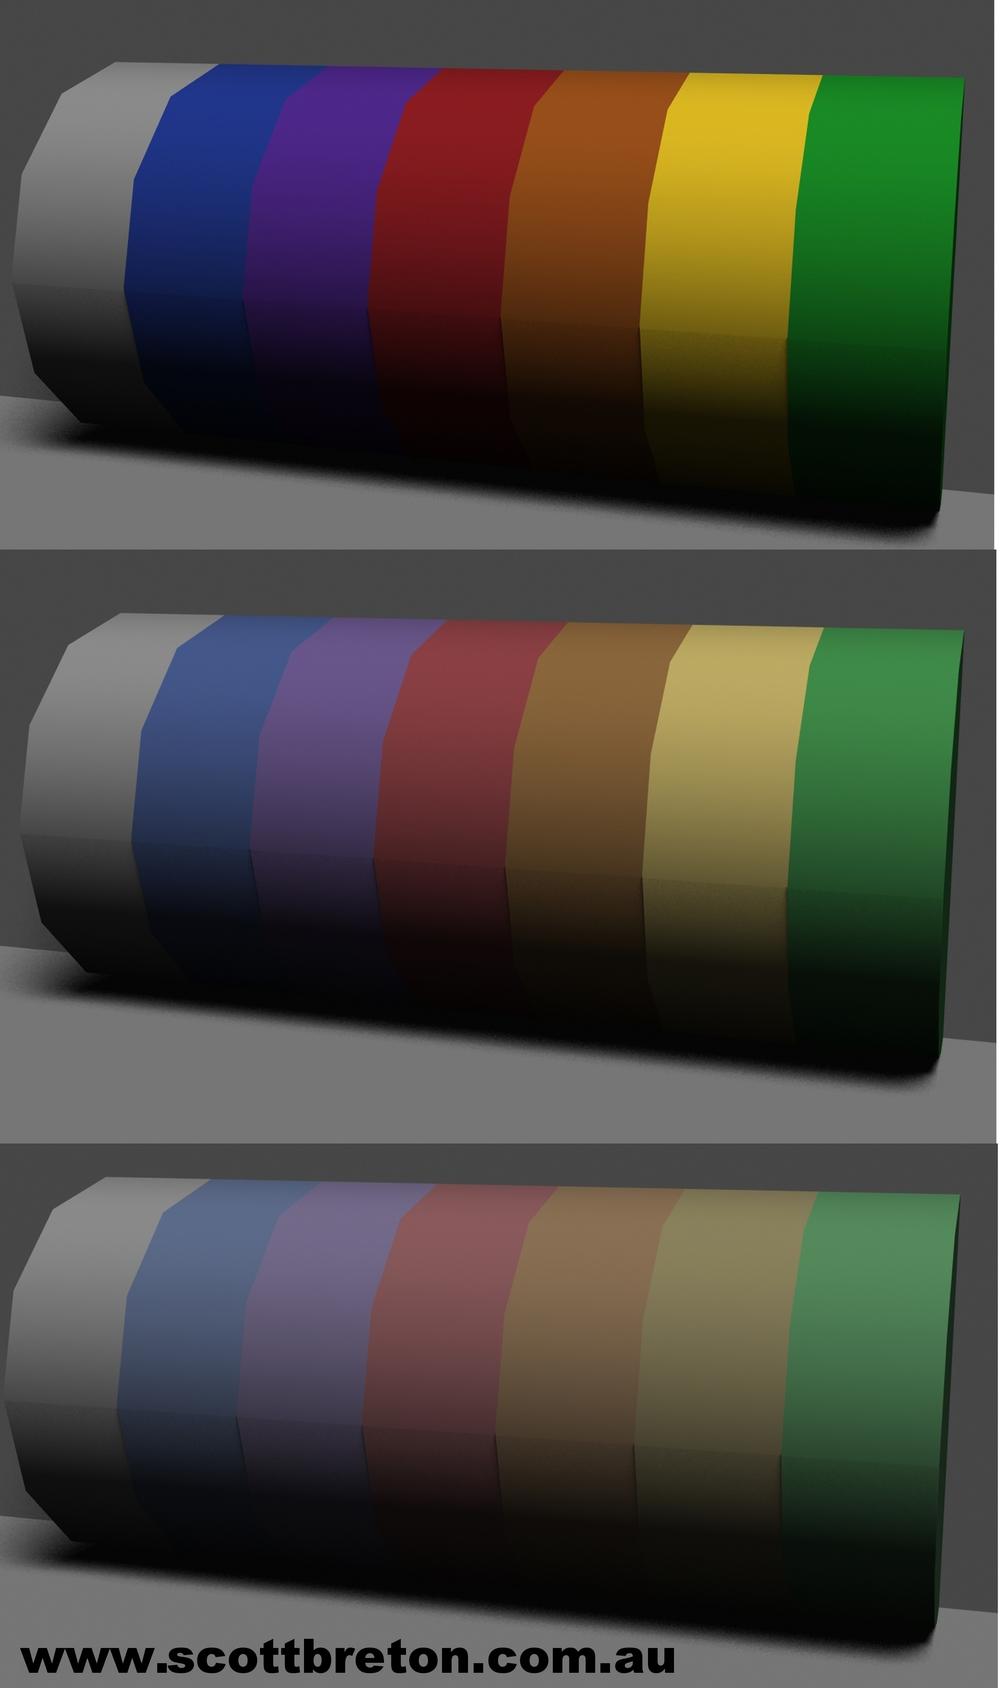 Diagram 4: Same light, varied chroma of objects